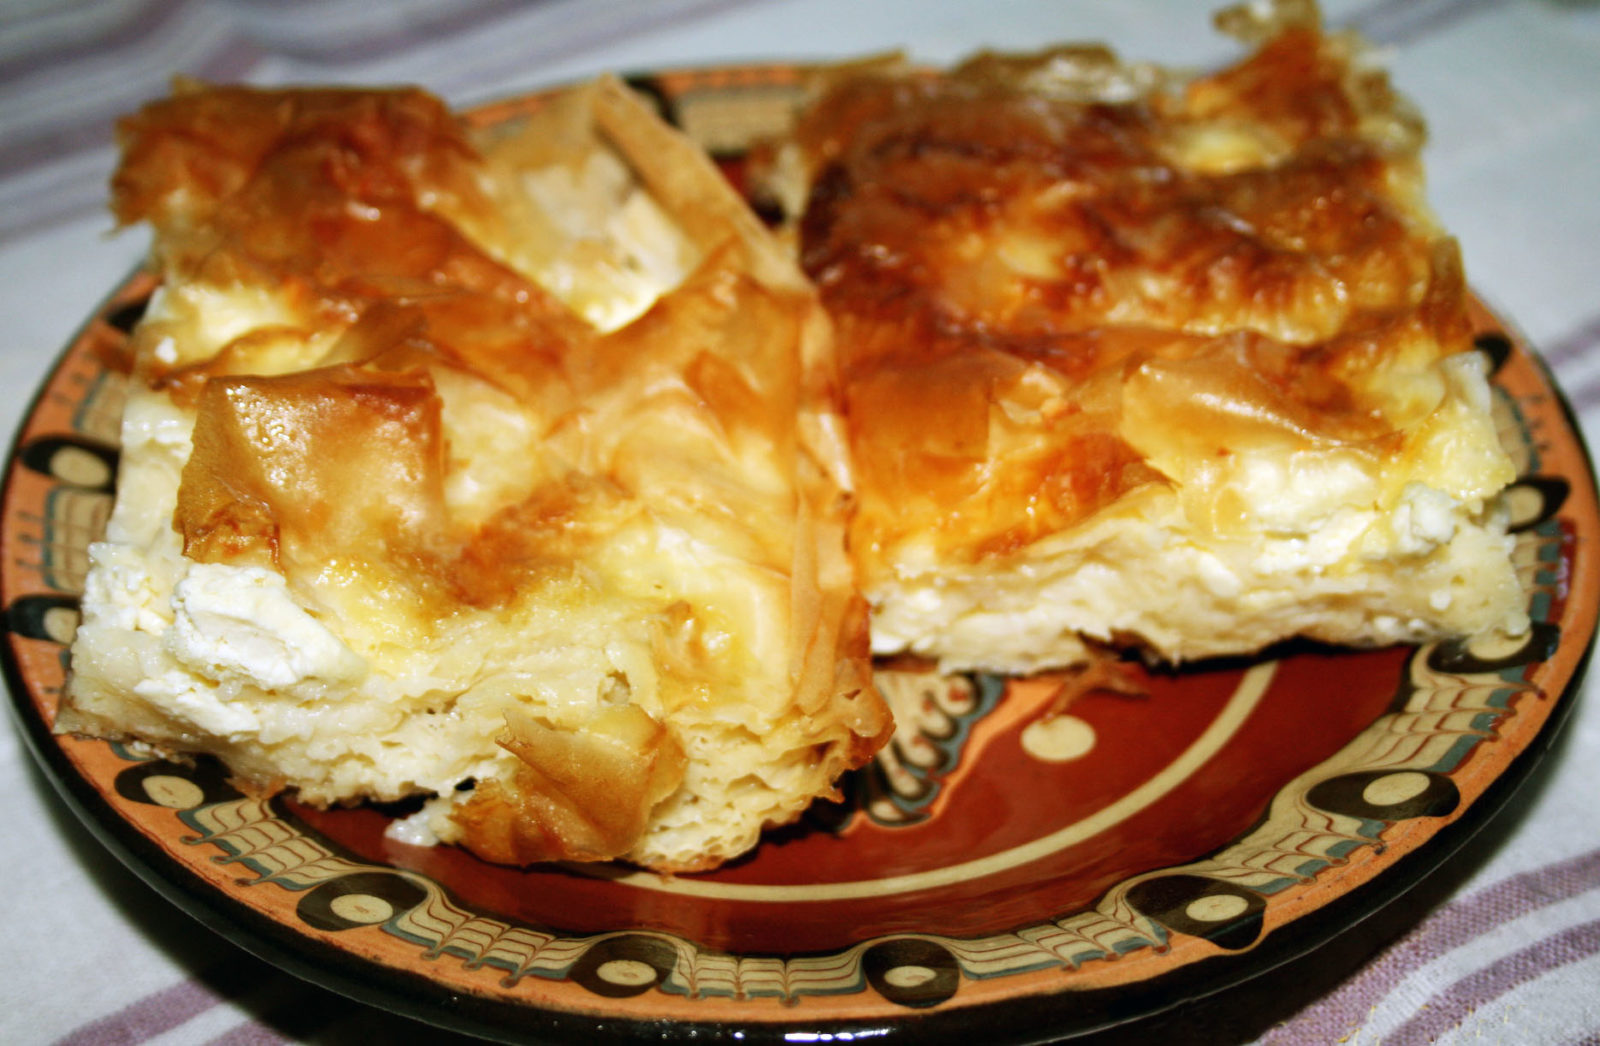 Баница - Болгарская национальная кухня